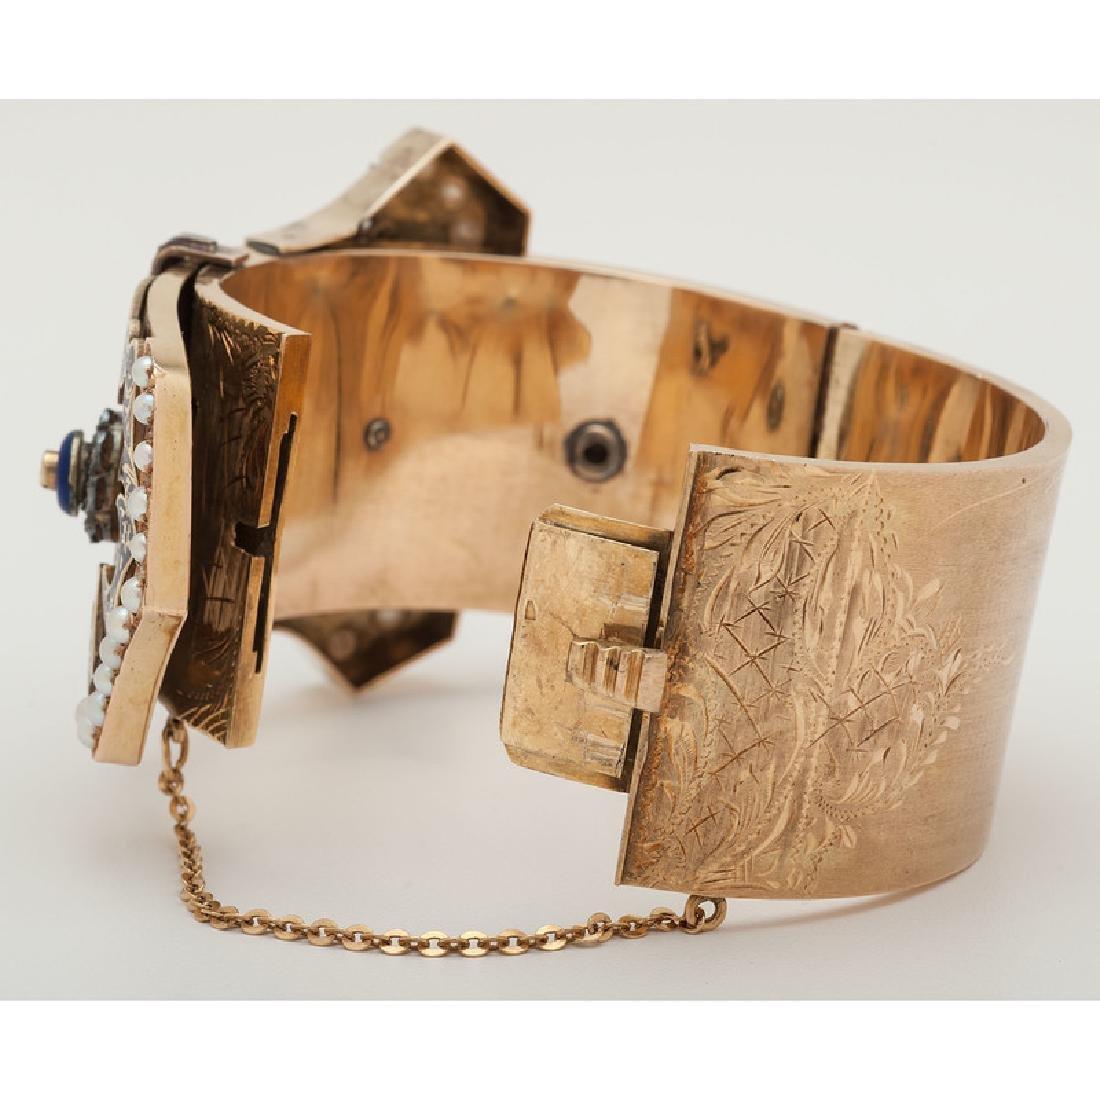 14 Karat Yellow Gold Buckle Bracelet - 5